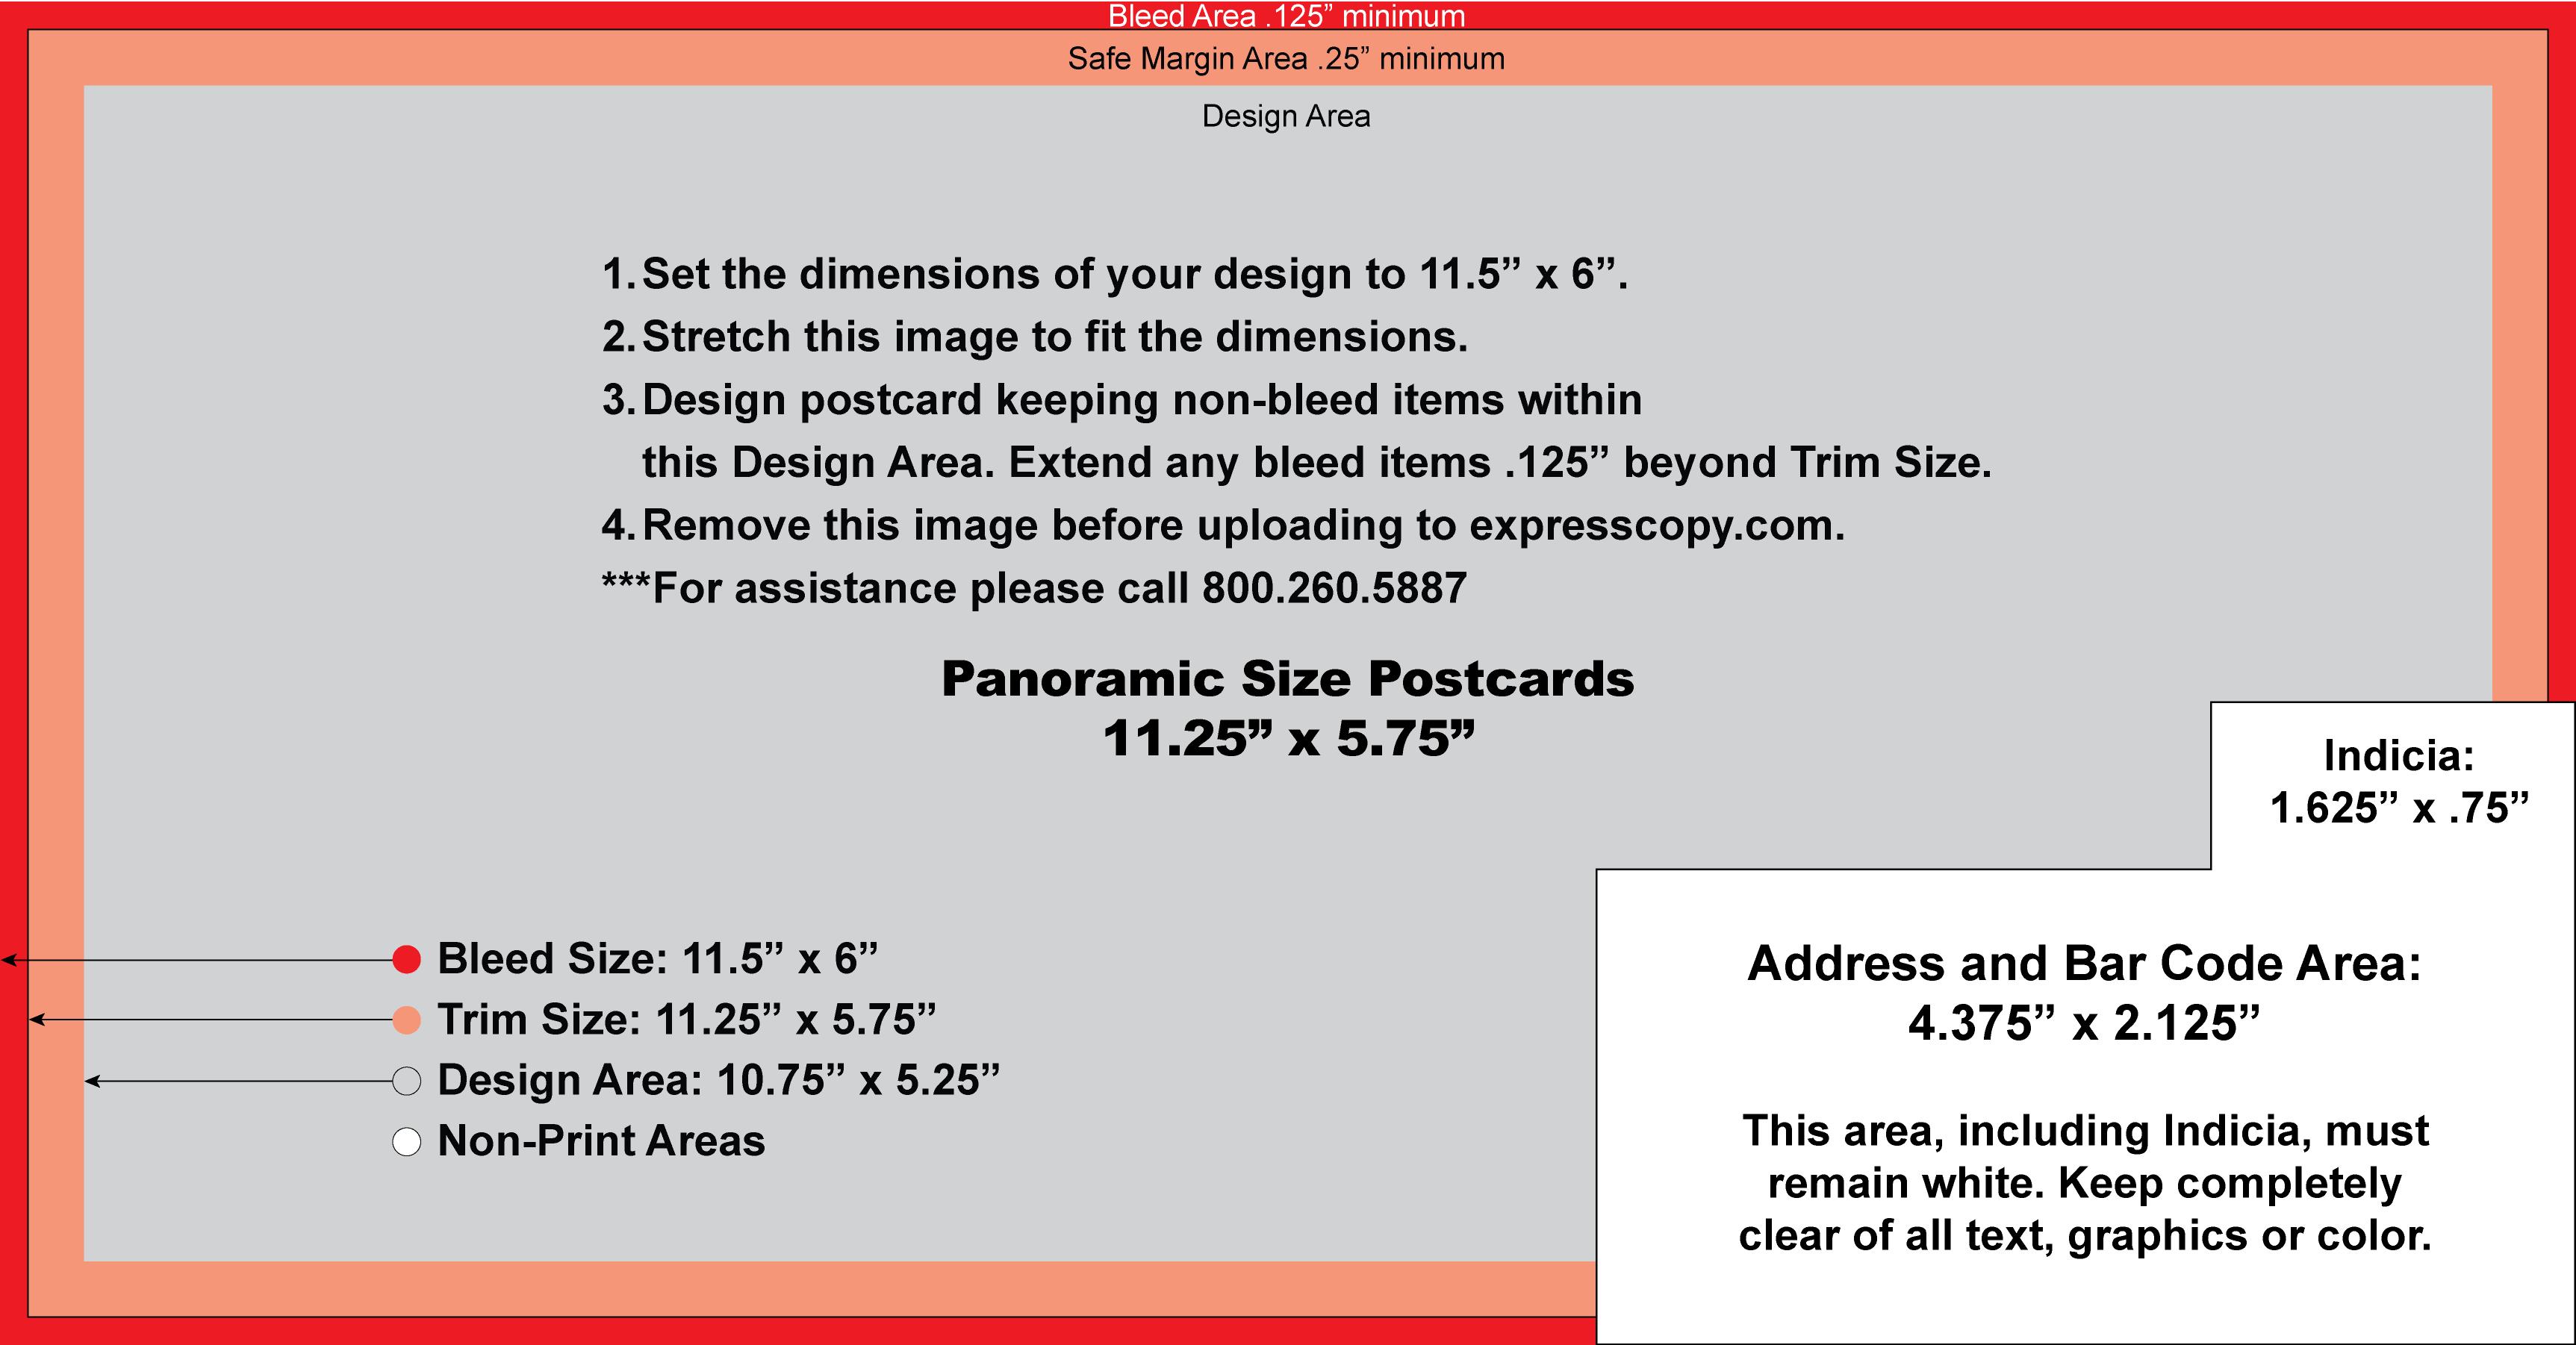 Postcard Specifications & Postcard Postal Regulations